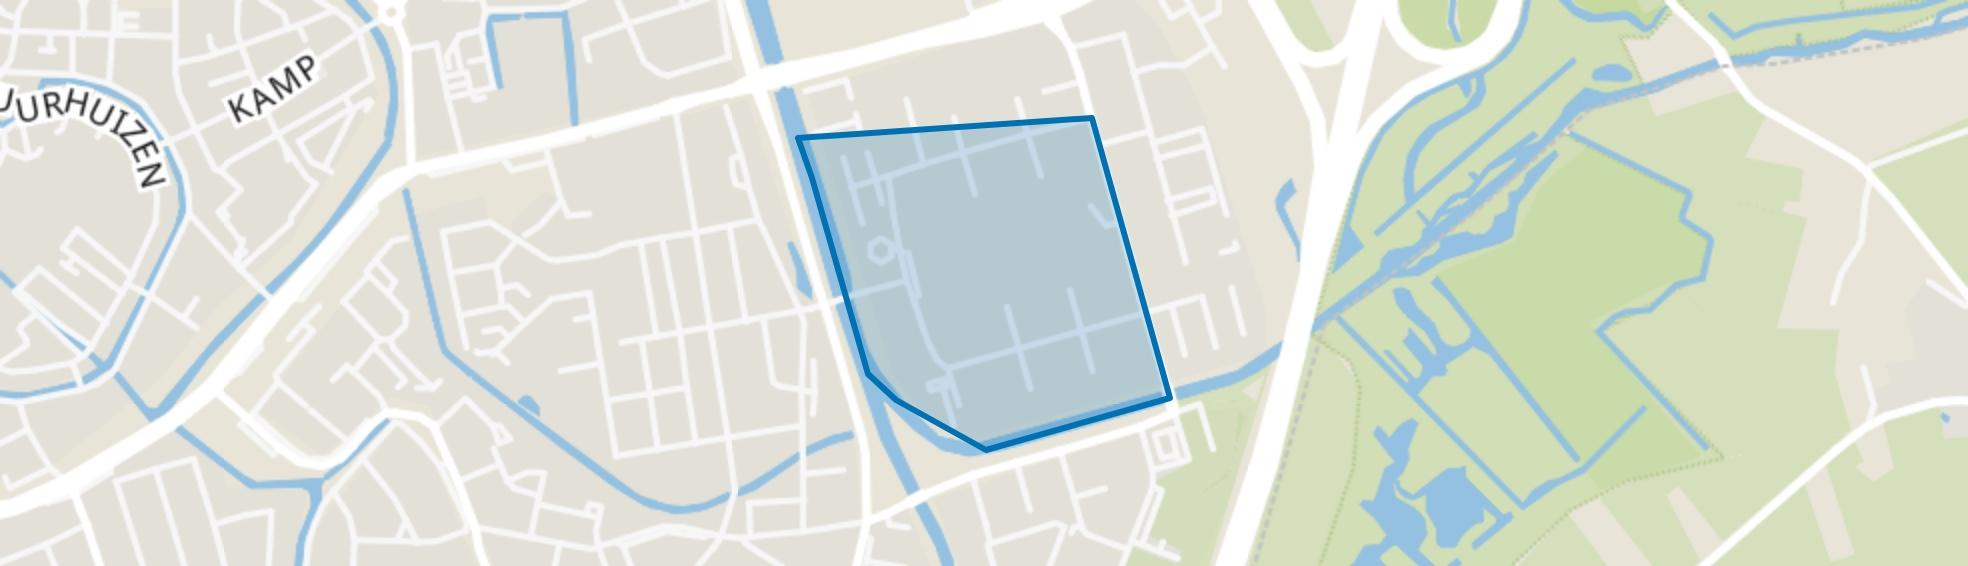 Romeostraat, Amersfoort map